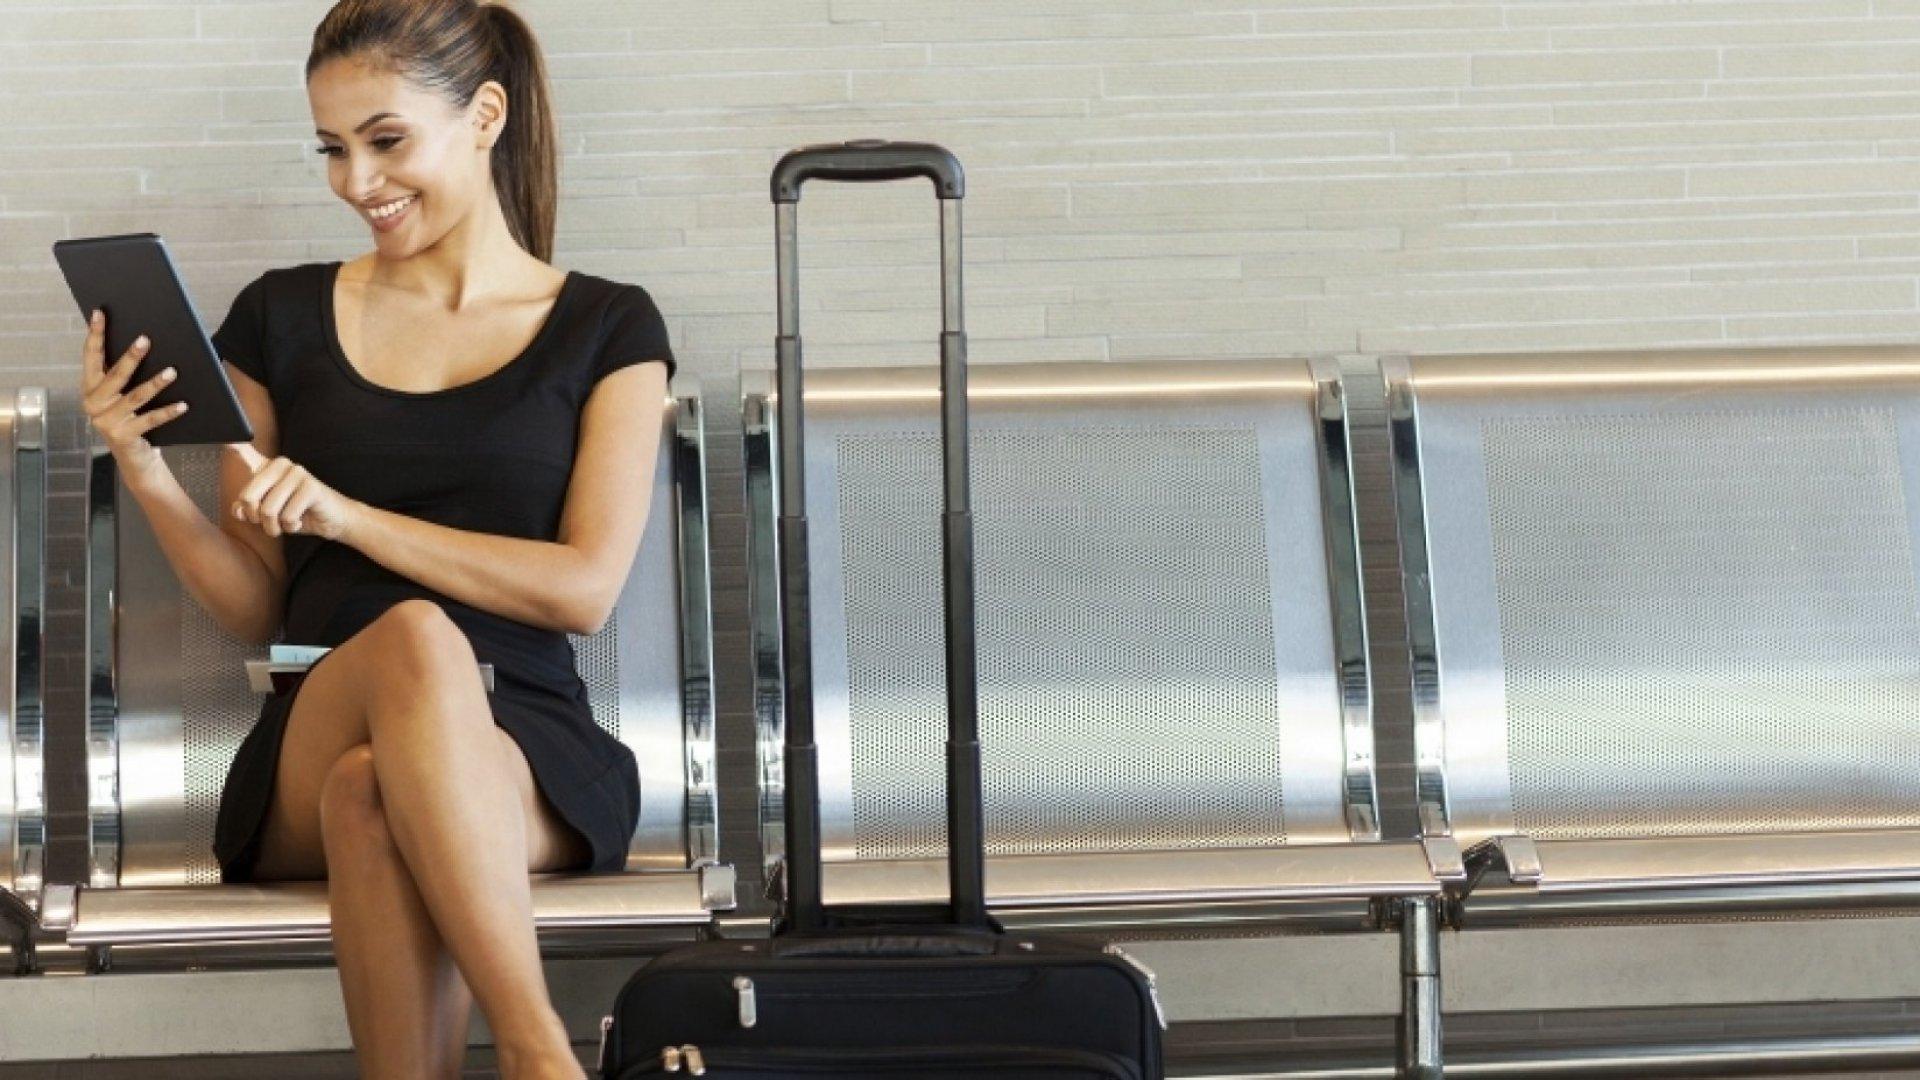 9 Ways to Make Business Travel a Joy